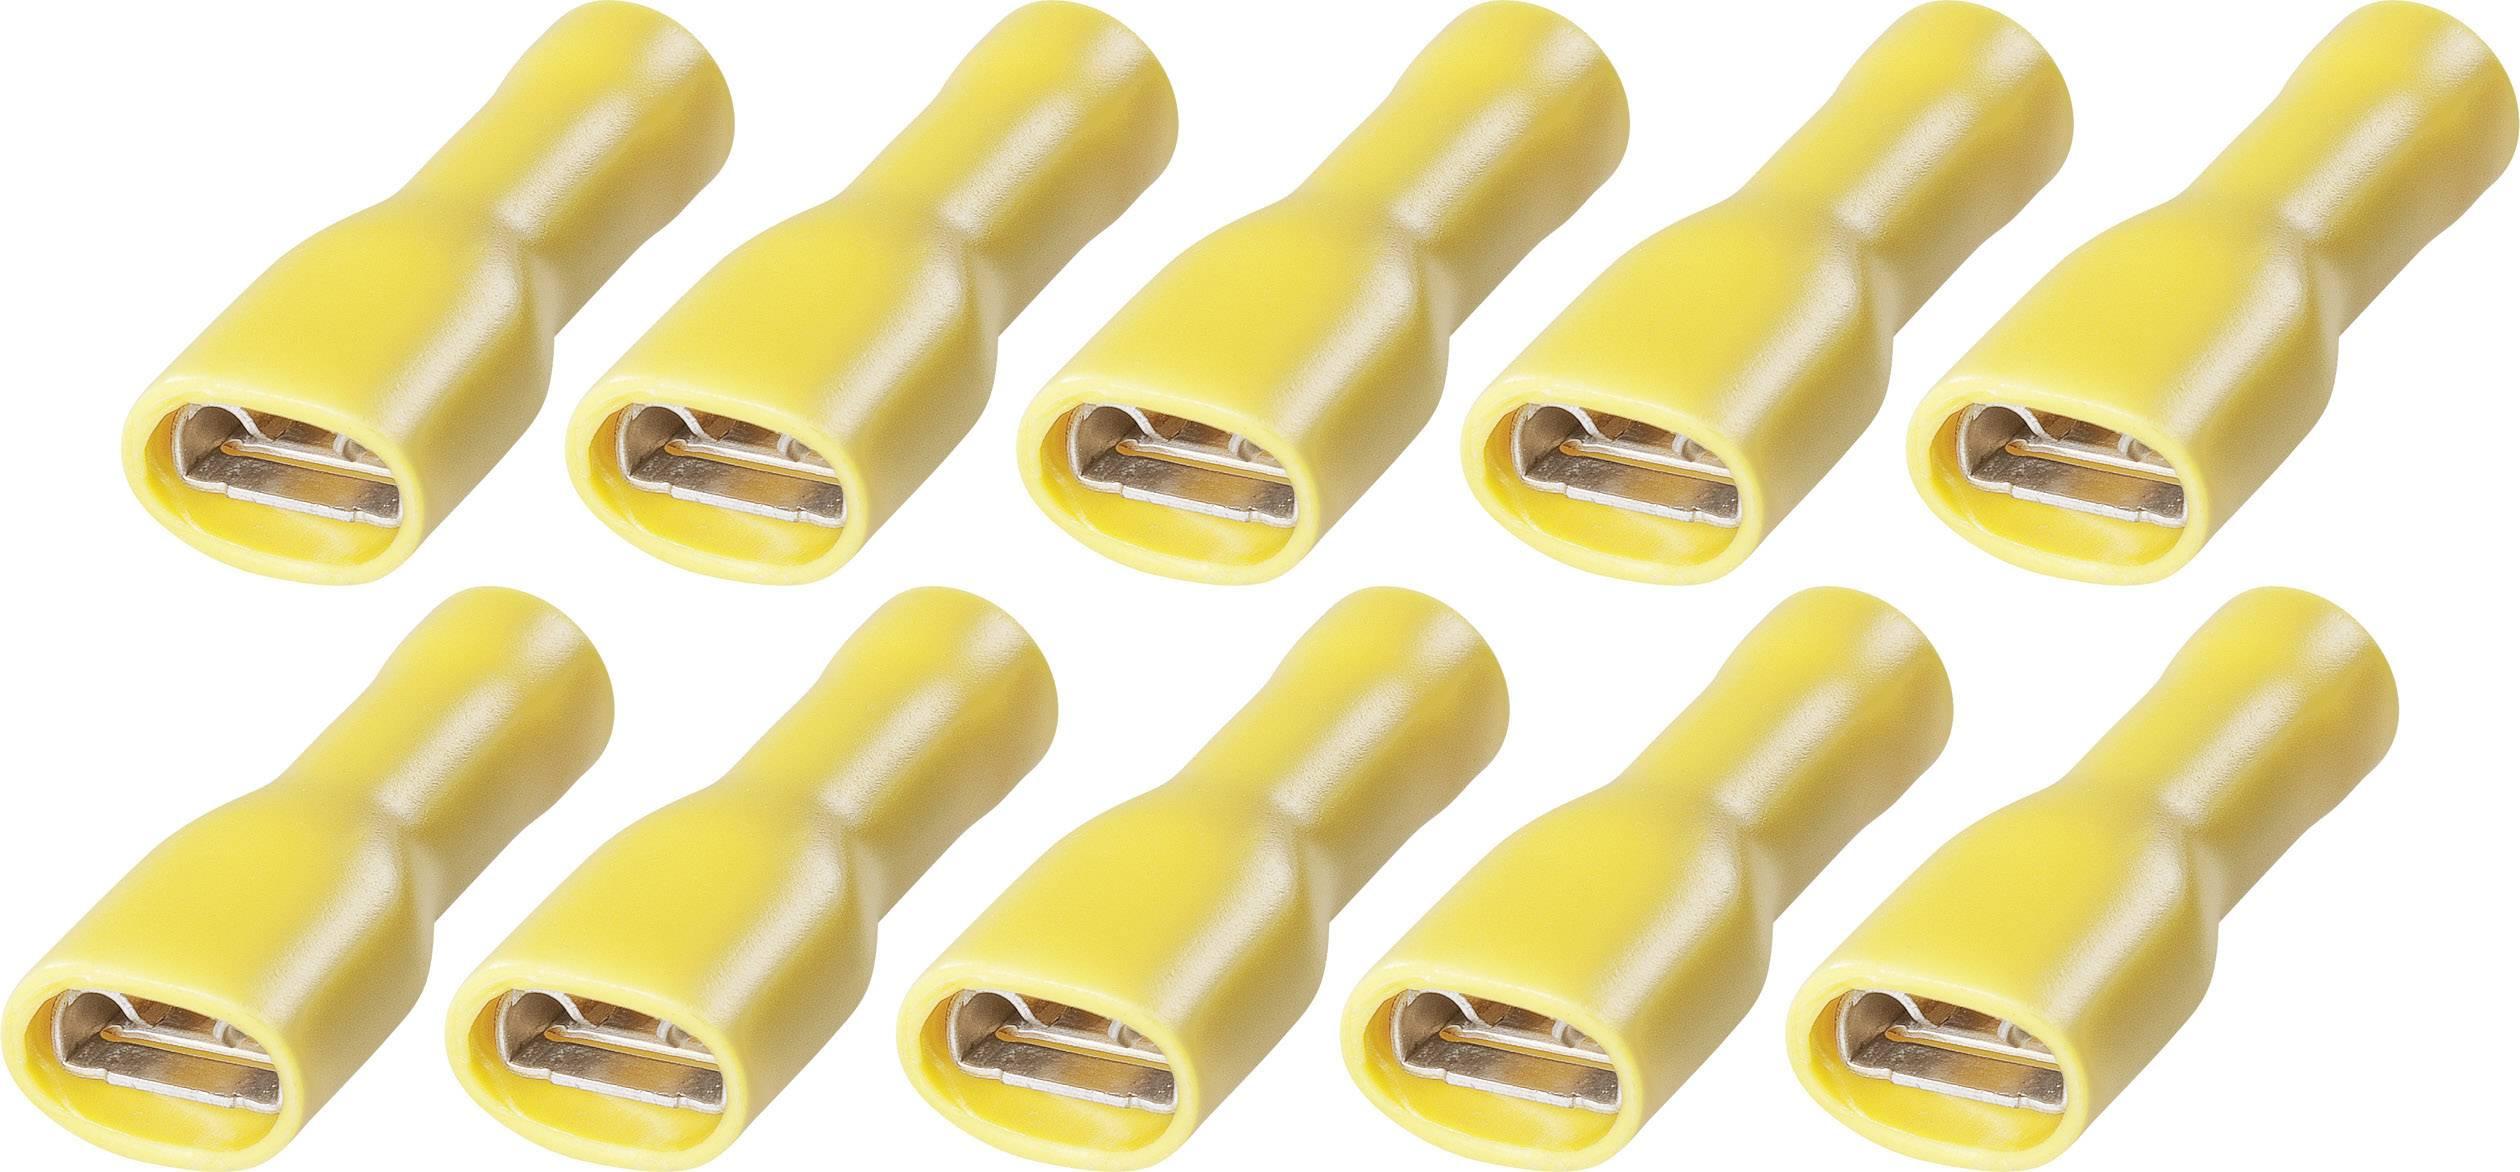 Sada upevnení faston FSPV 6,3 až 6, 3,258,921, 6,3 mm, 2,5 - 6 mm², žltá, 10 ks